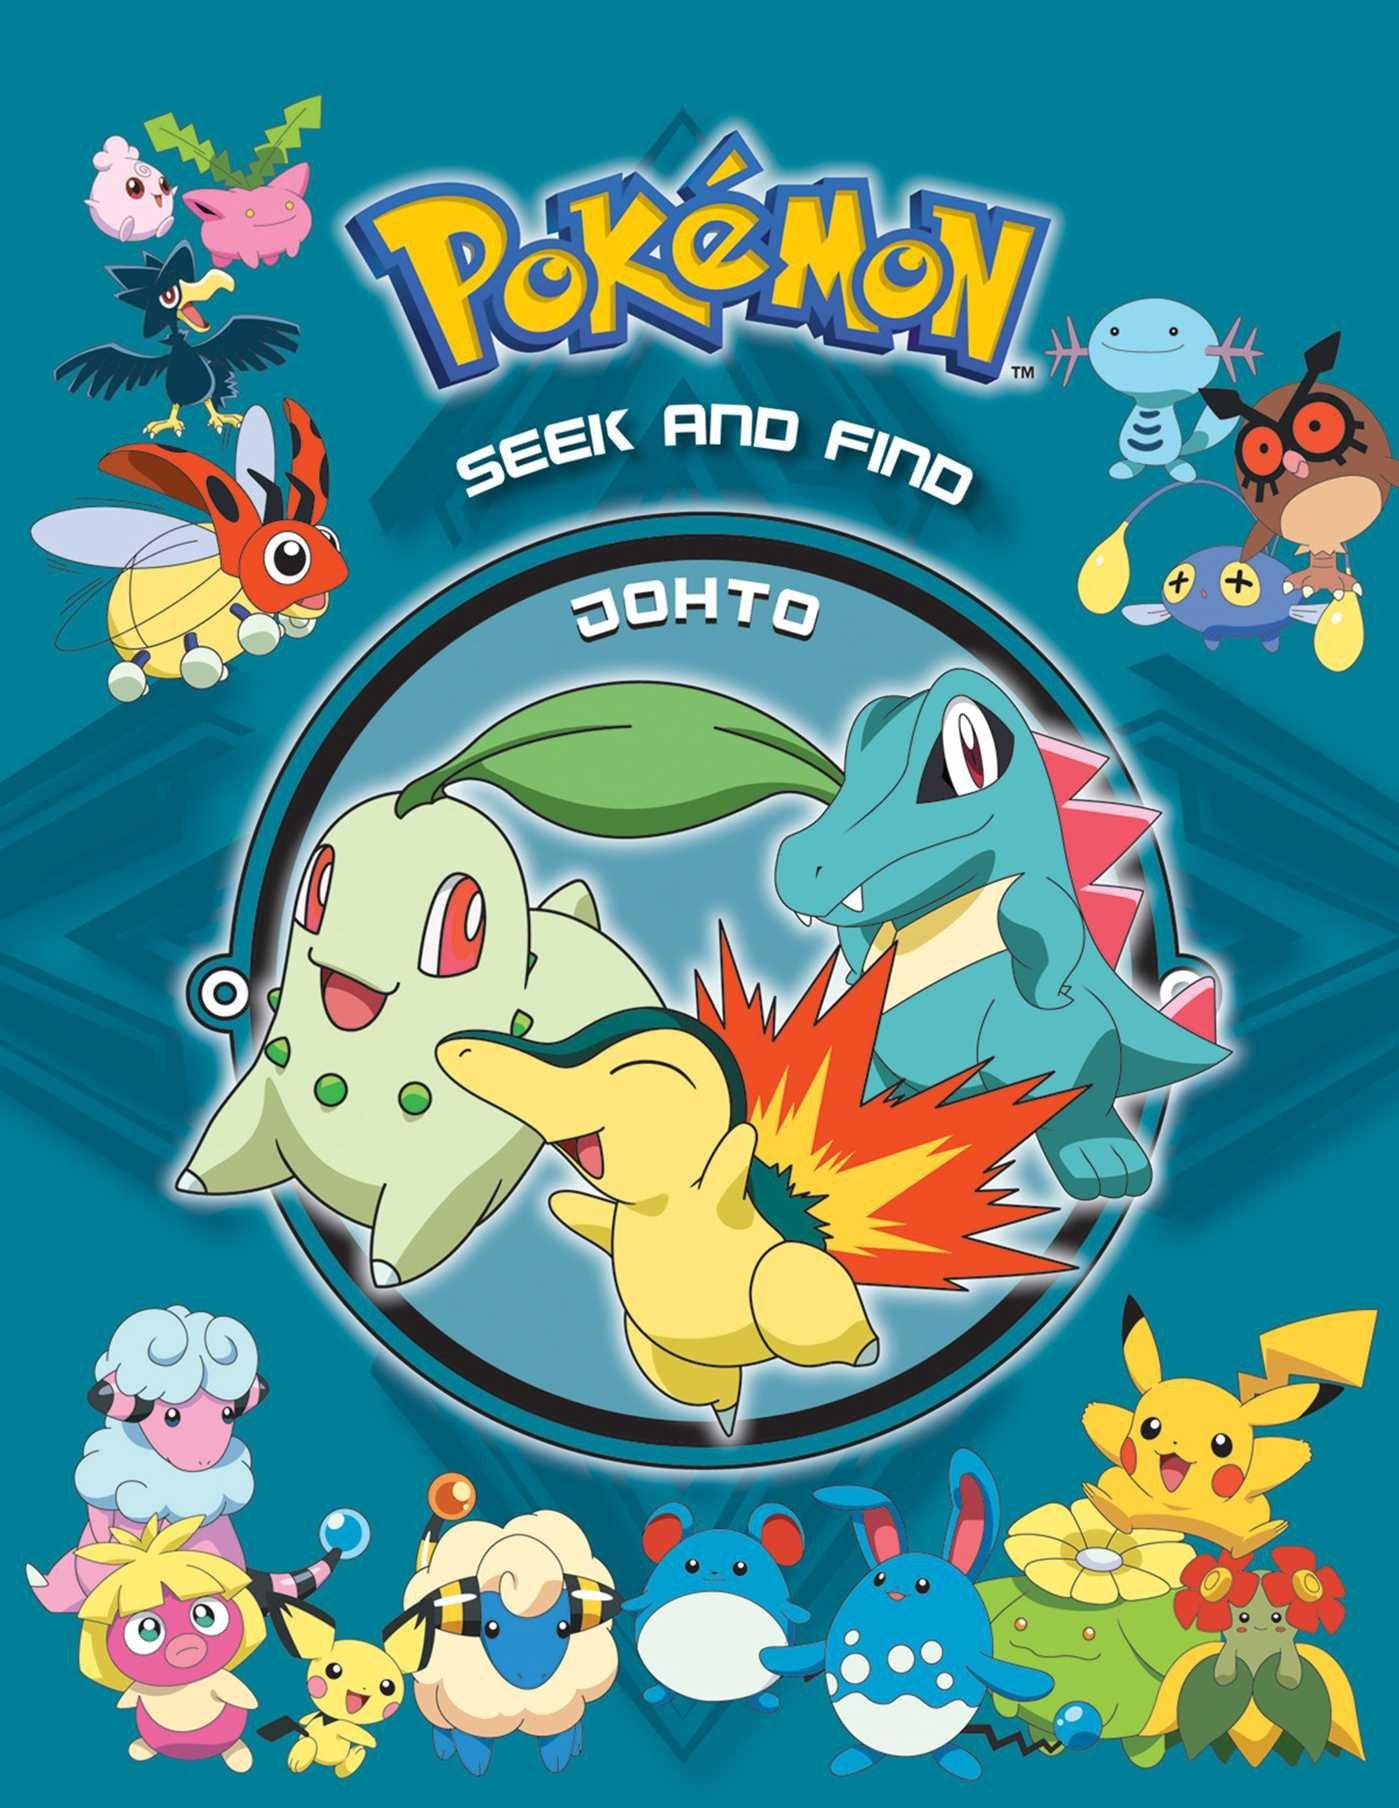 Pokémon Seek and Find - Johto (Pokemon)